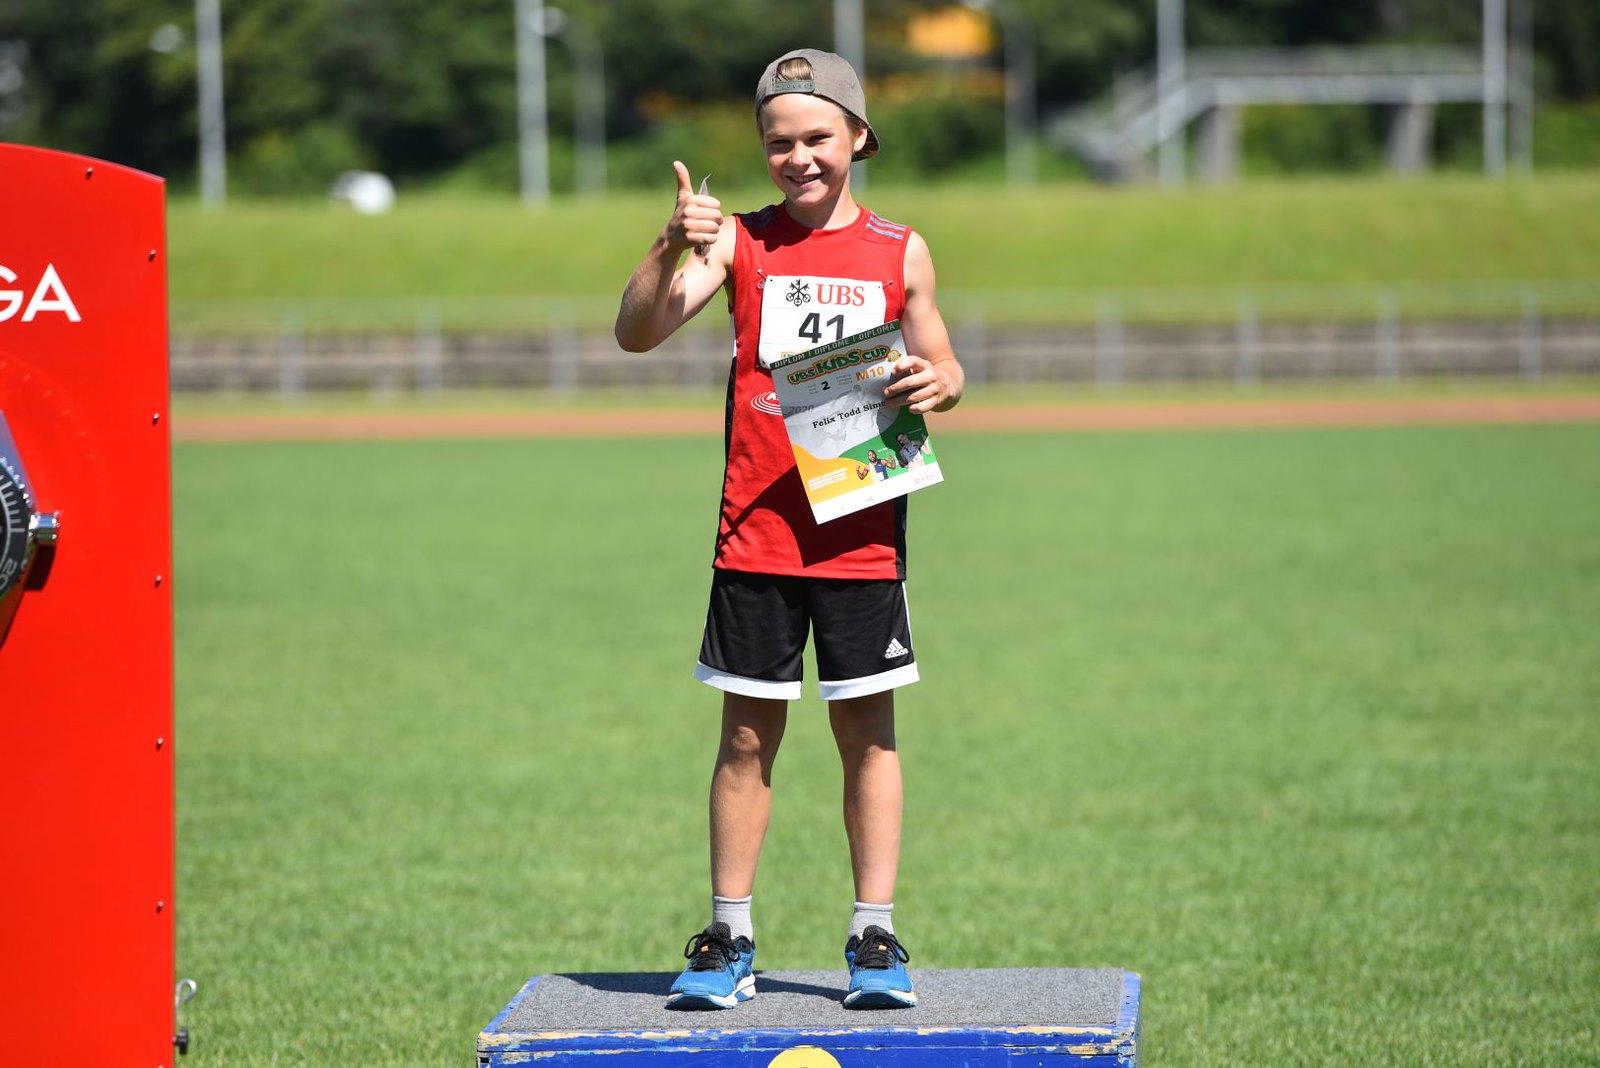 Kids Cup Langenthal – erster Wettkampf nach Pause